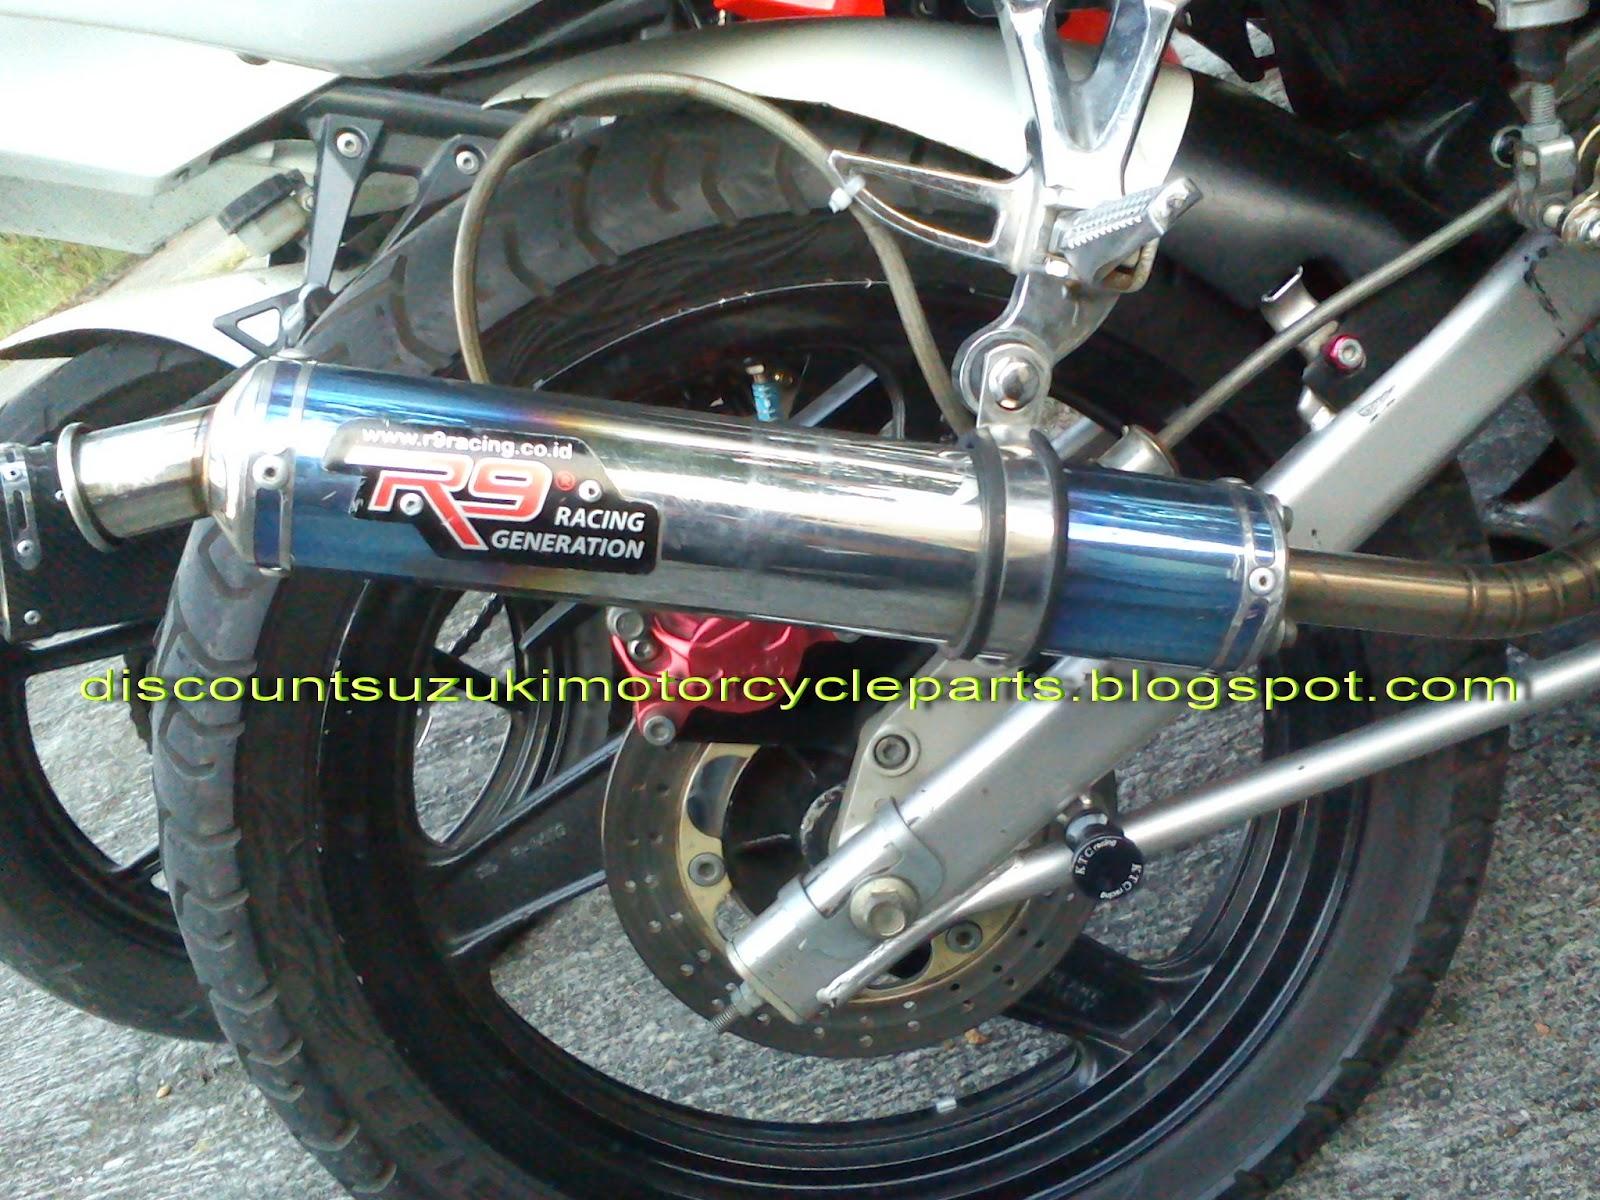 harga knalpot r9 racing generation ninja 250 rr ~ motorcycle part